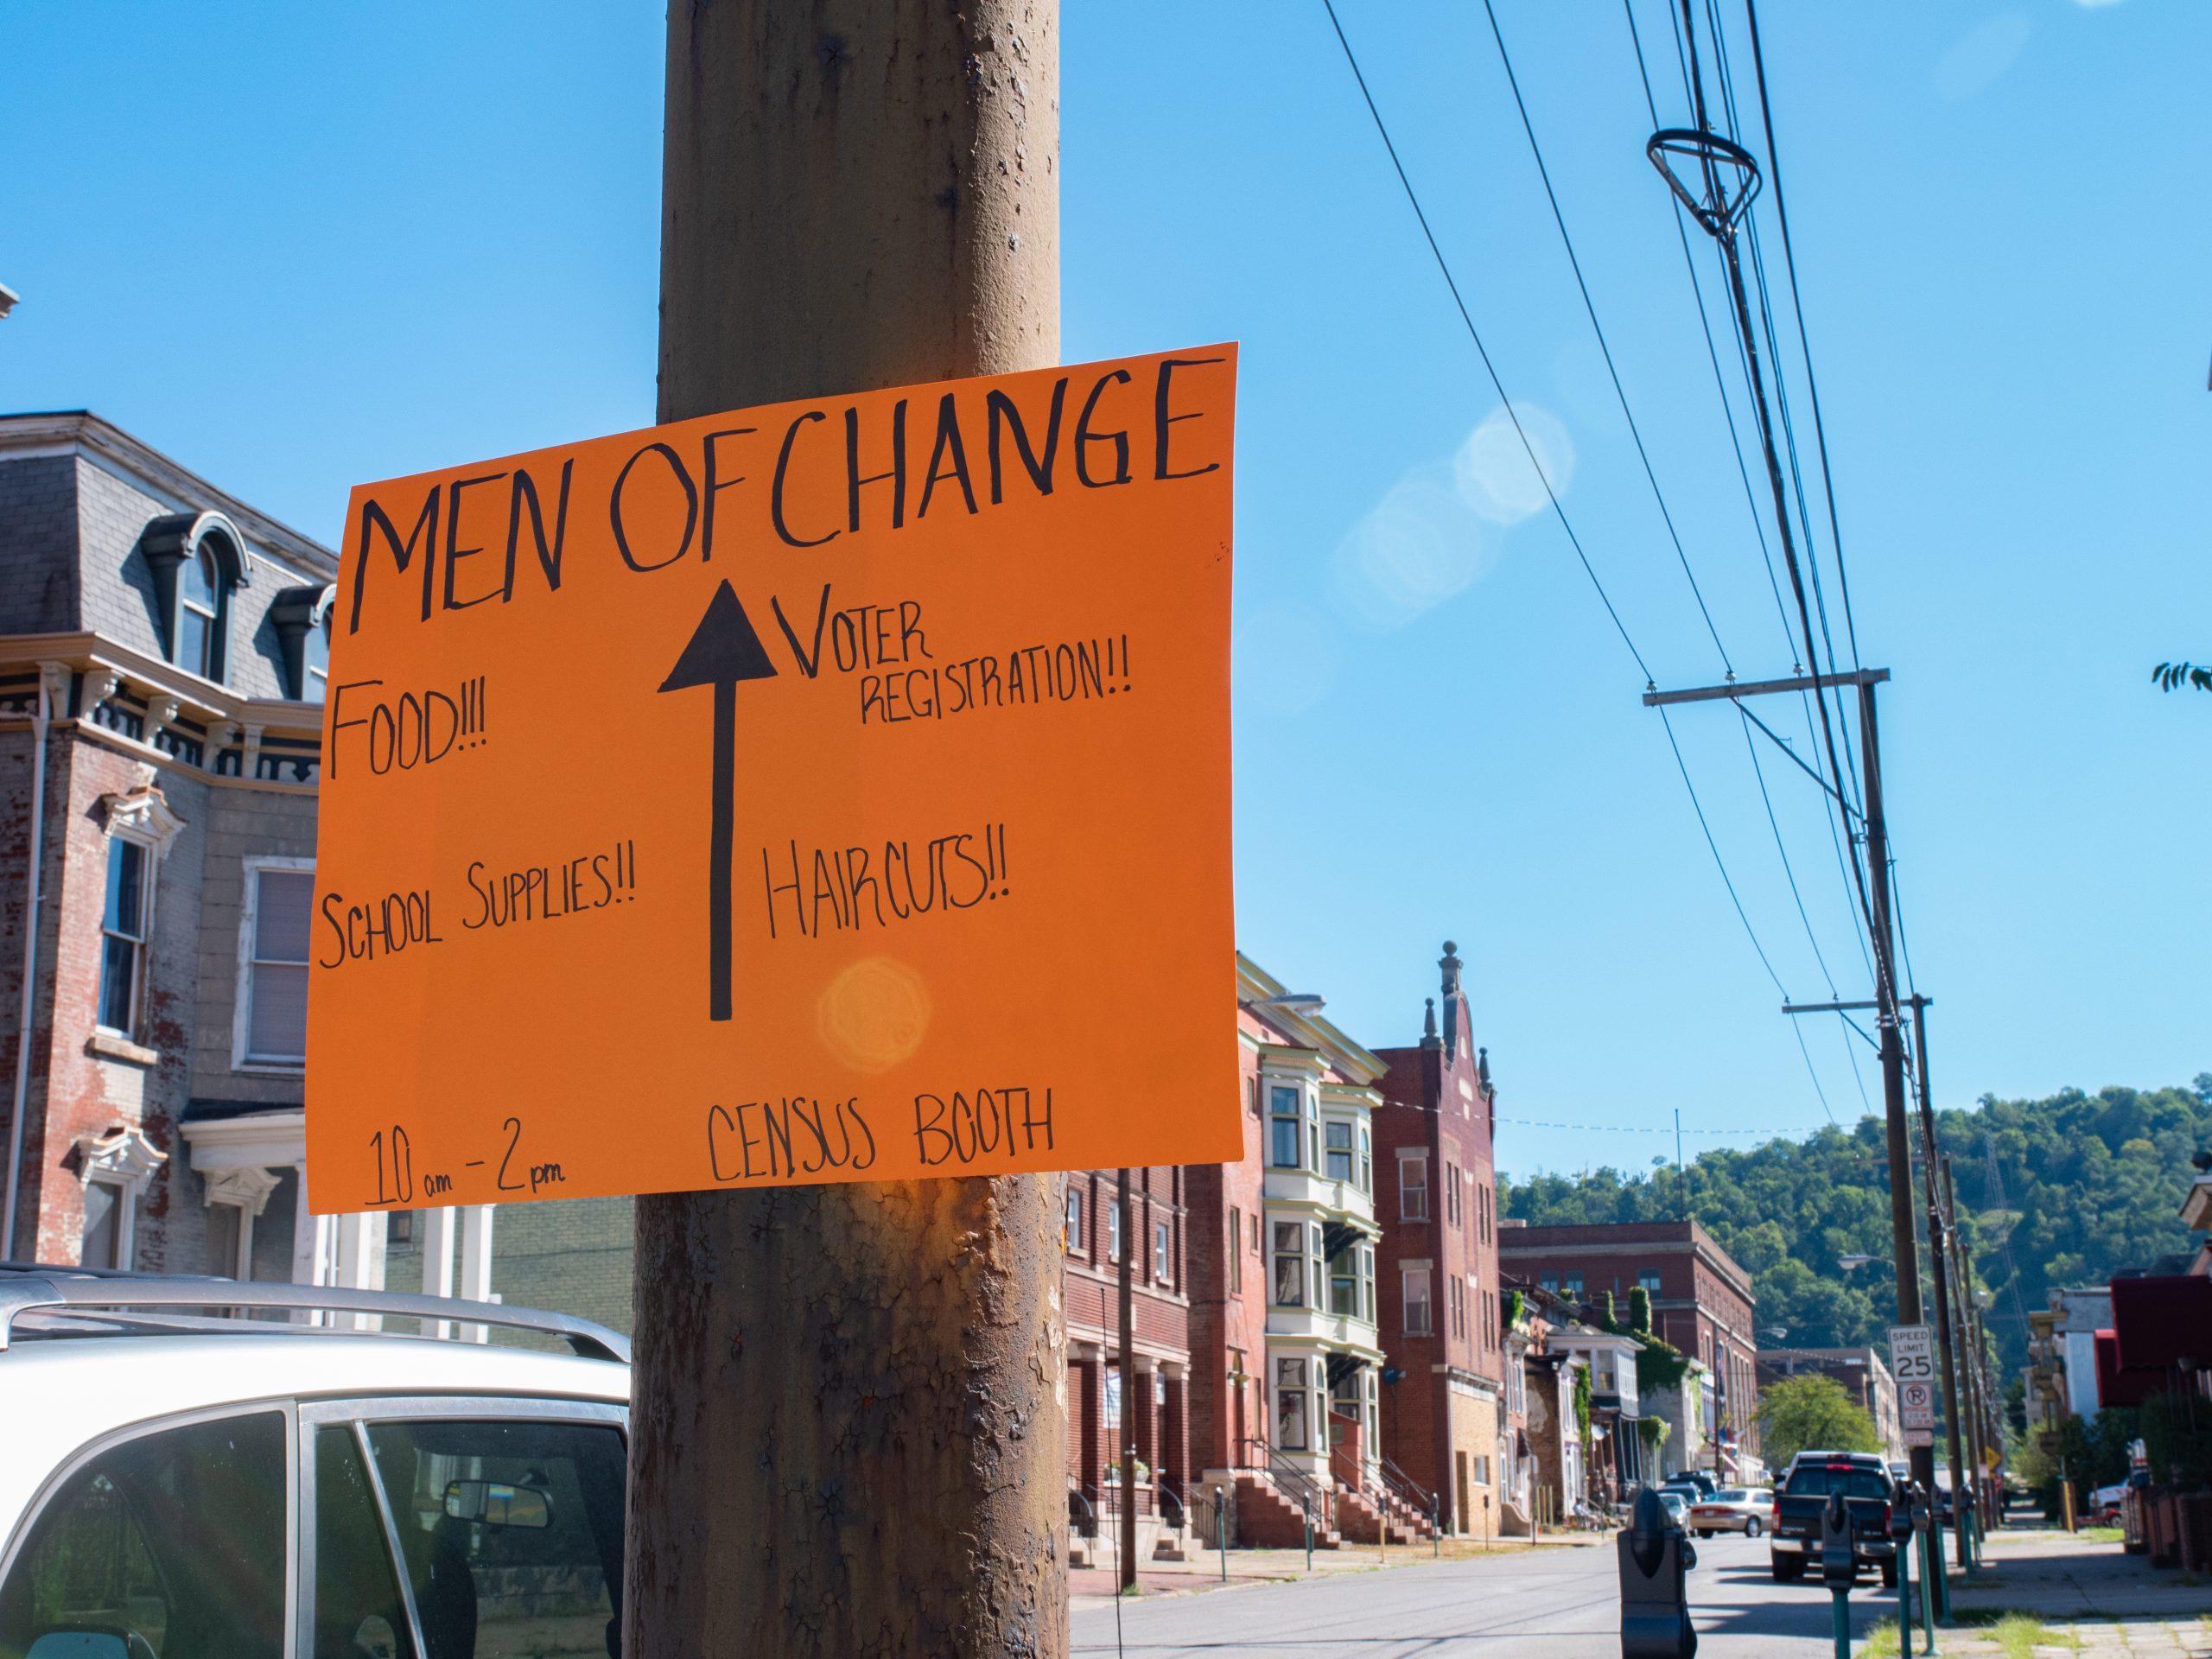 Men of Change